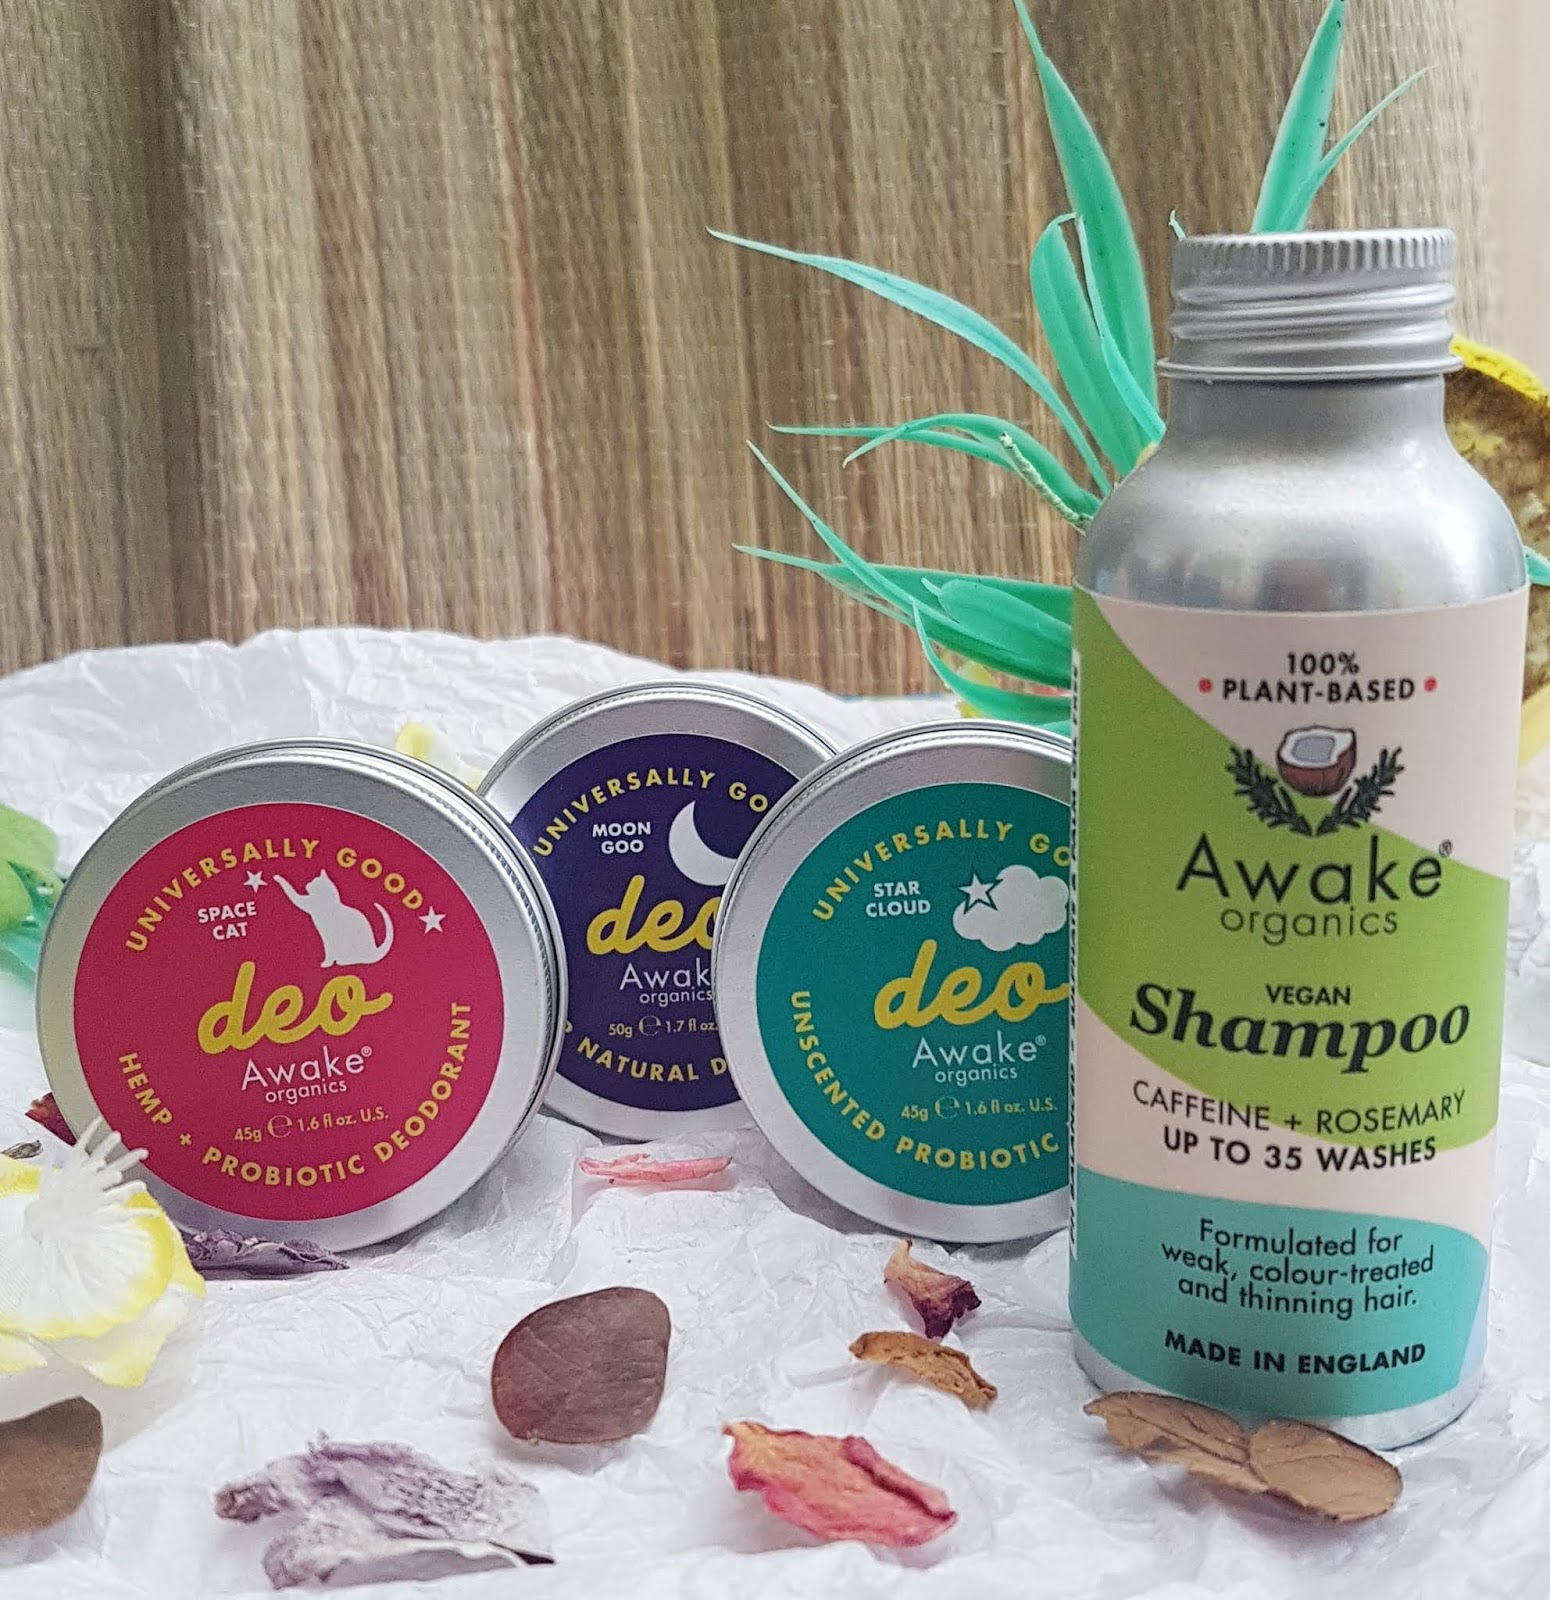 Plastic Free Essentials - Awake Organics Review